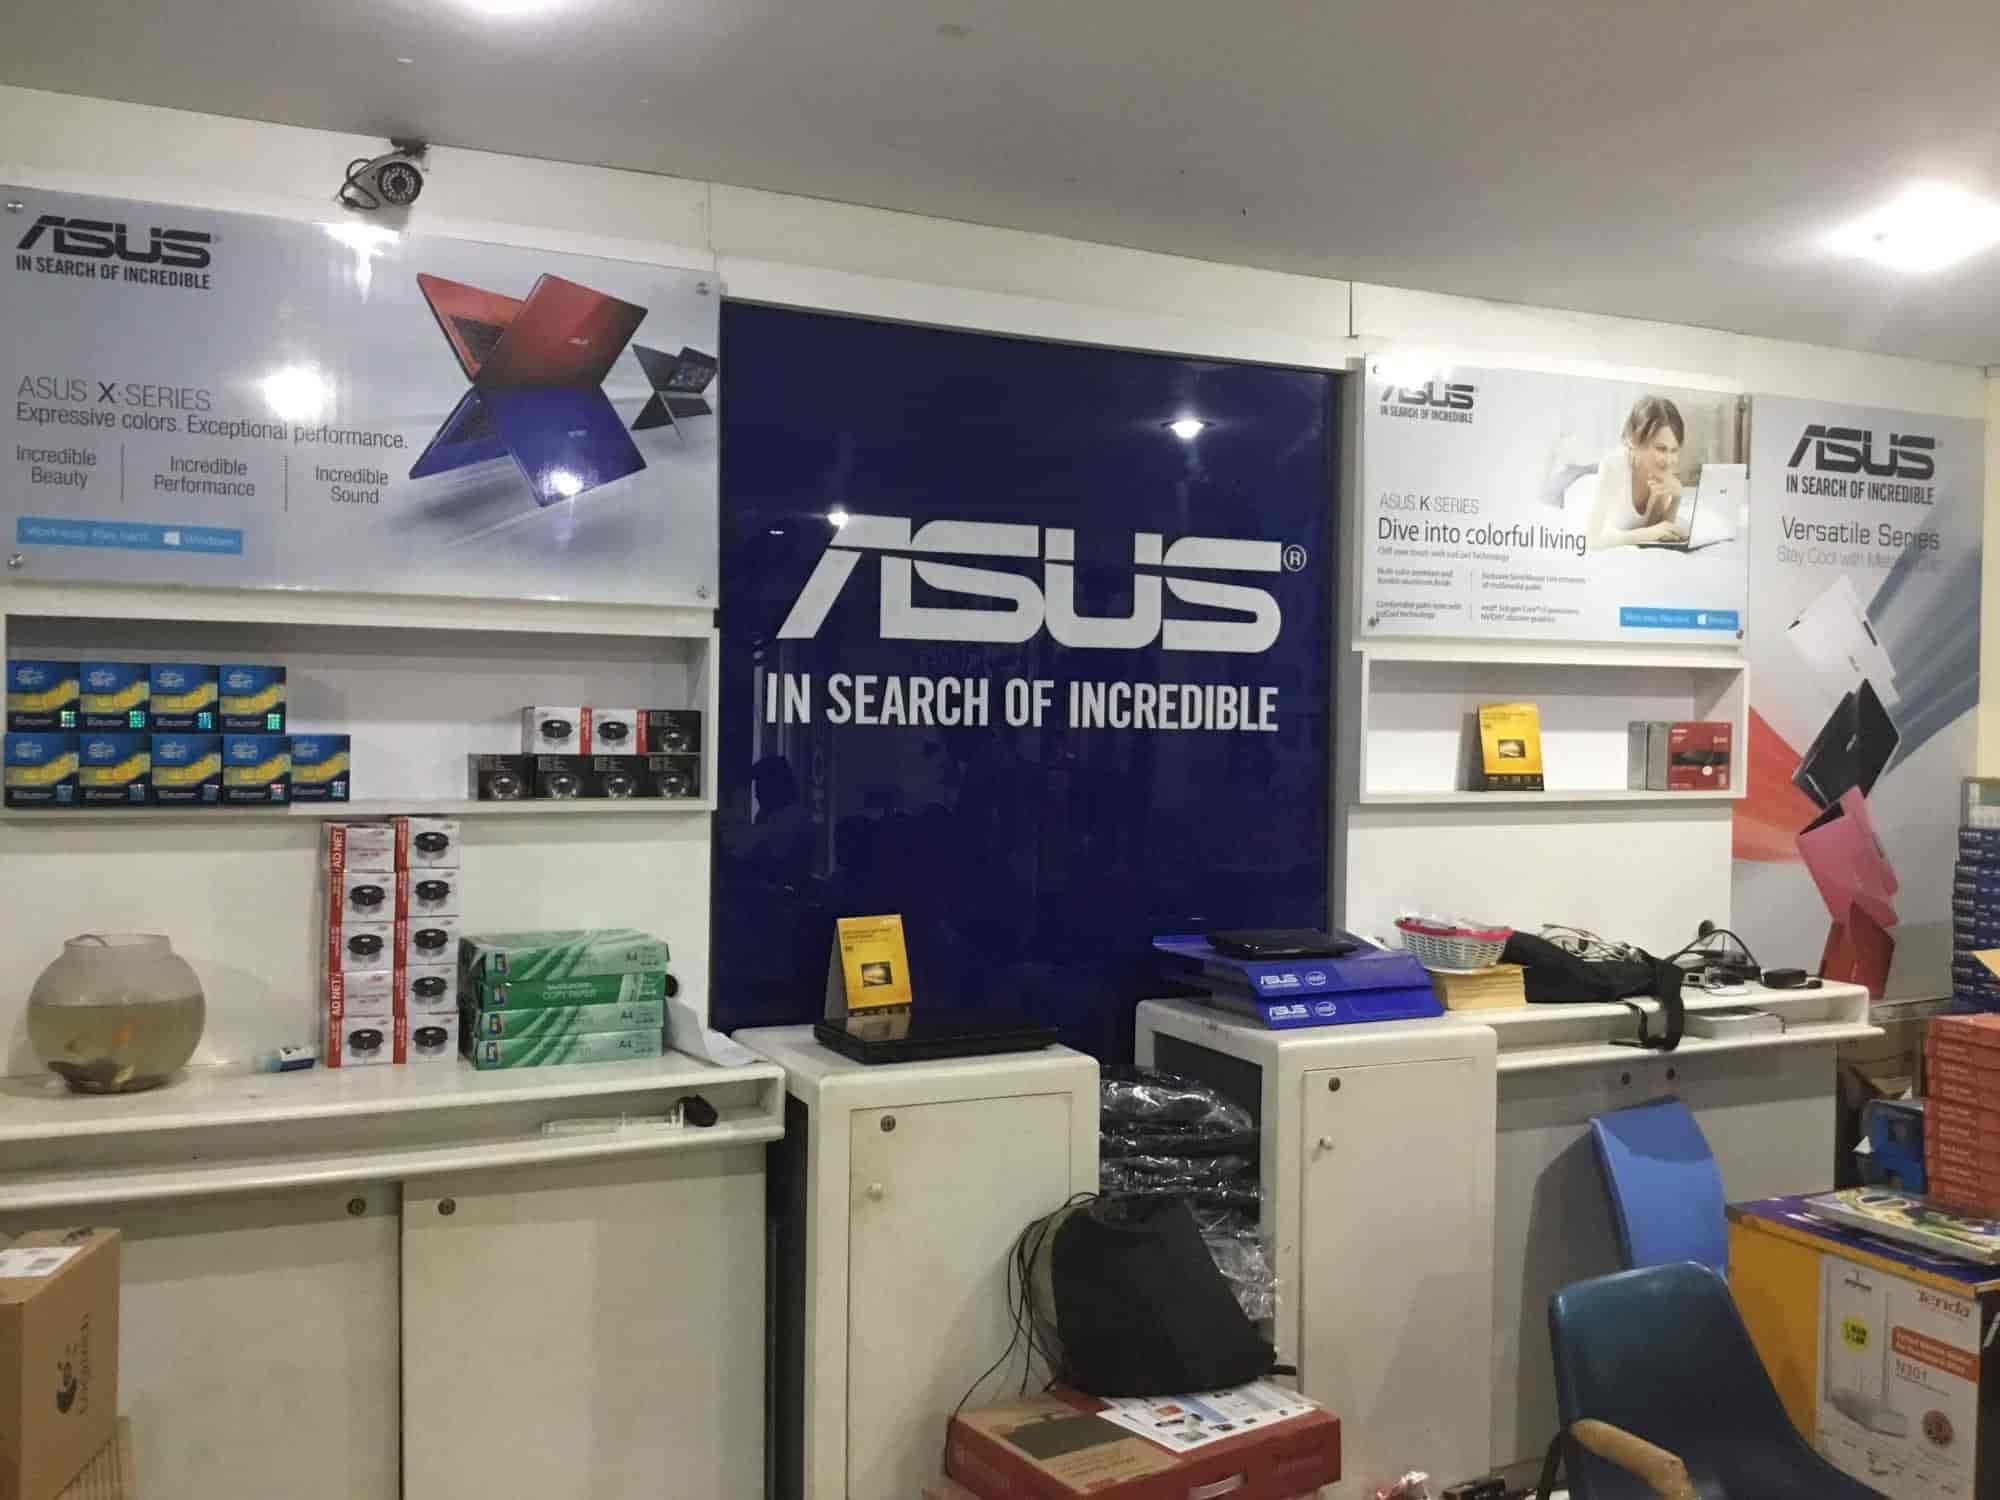 Sai Computers, Mg Road - Mobile Phone Repair & Services in